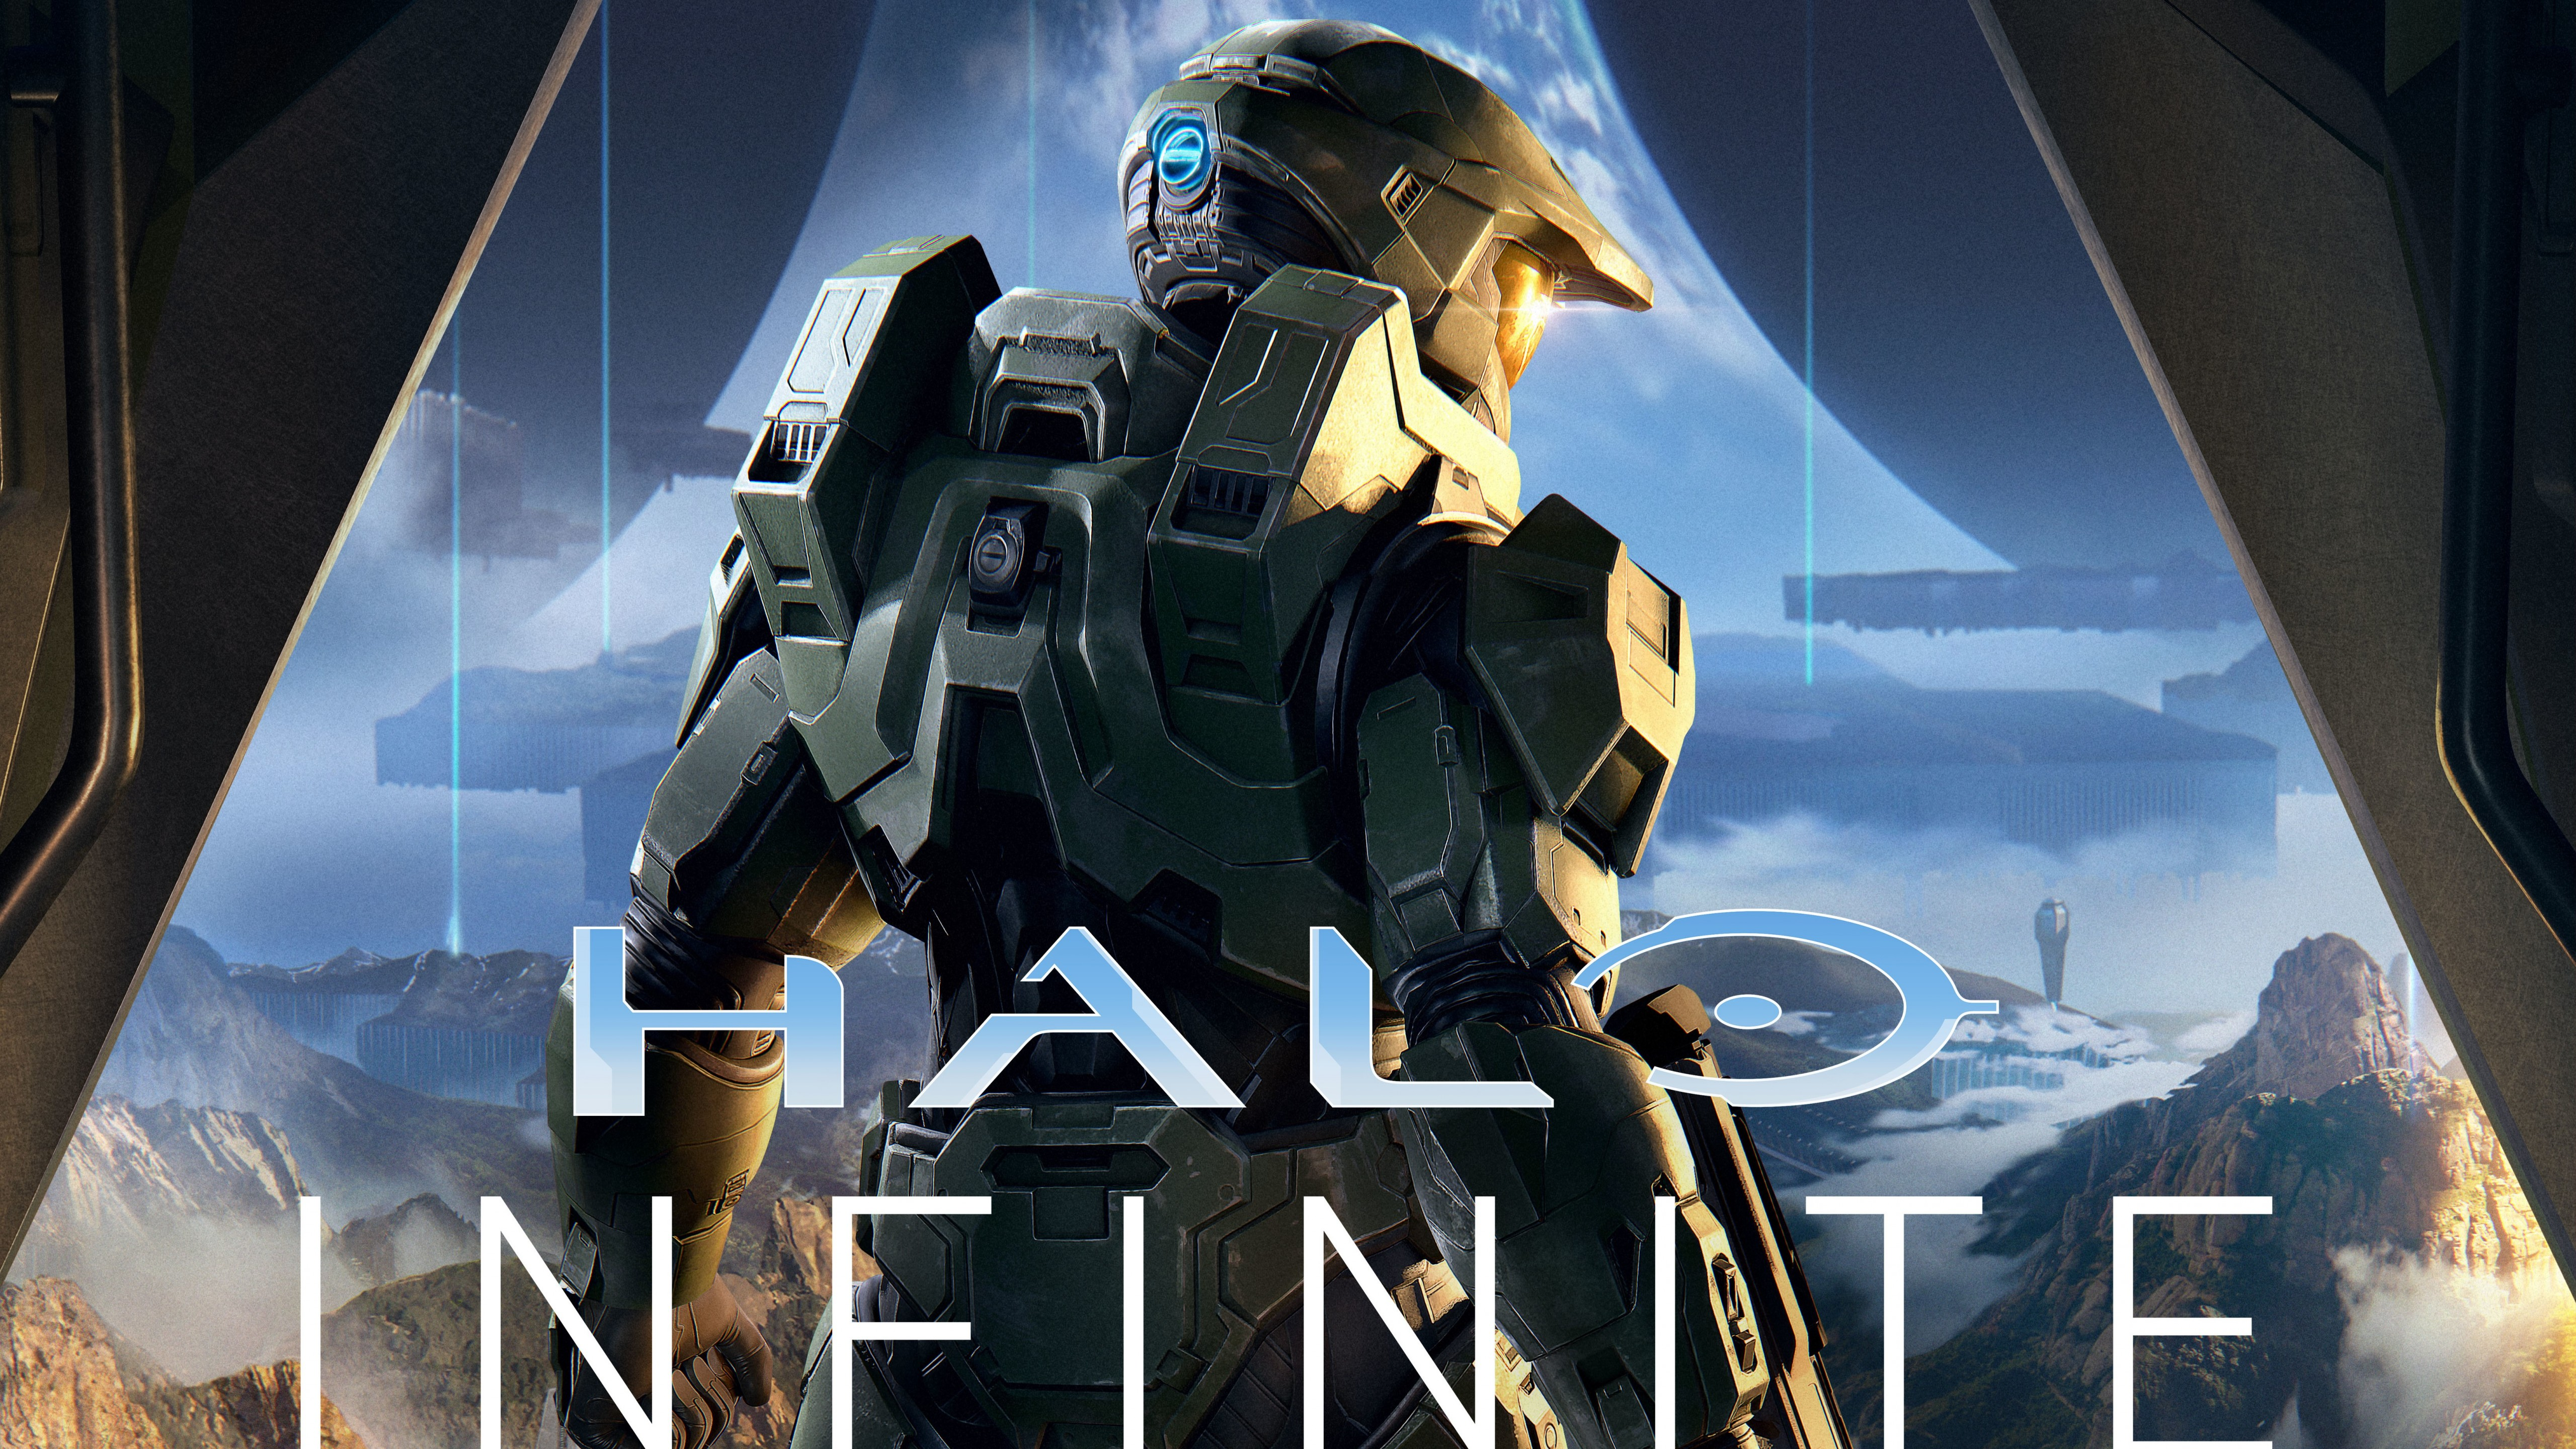 Fondos de pantalla Halo Infinite Poster